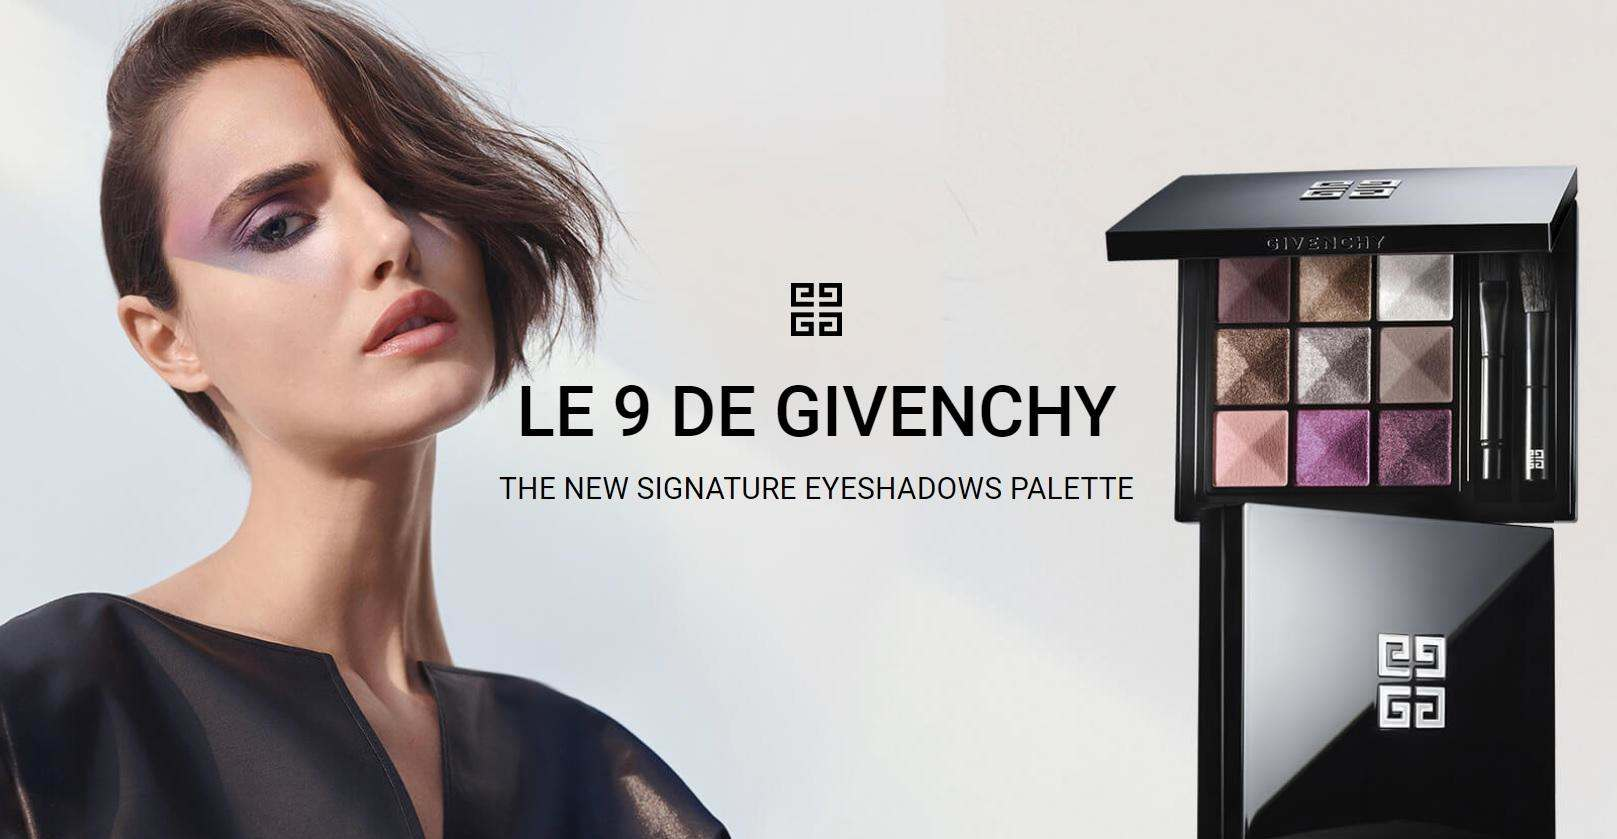 Незабаром! Феєрія кольору від Givenchy: нові палетки тіней для повік Le 9 De Givenchy Couture Eye Palettes!